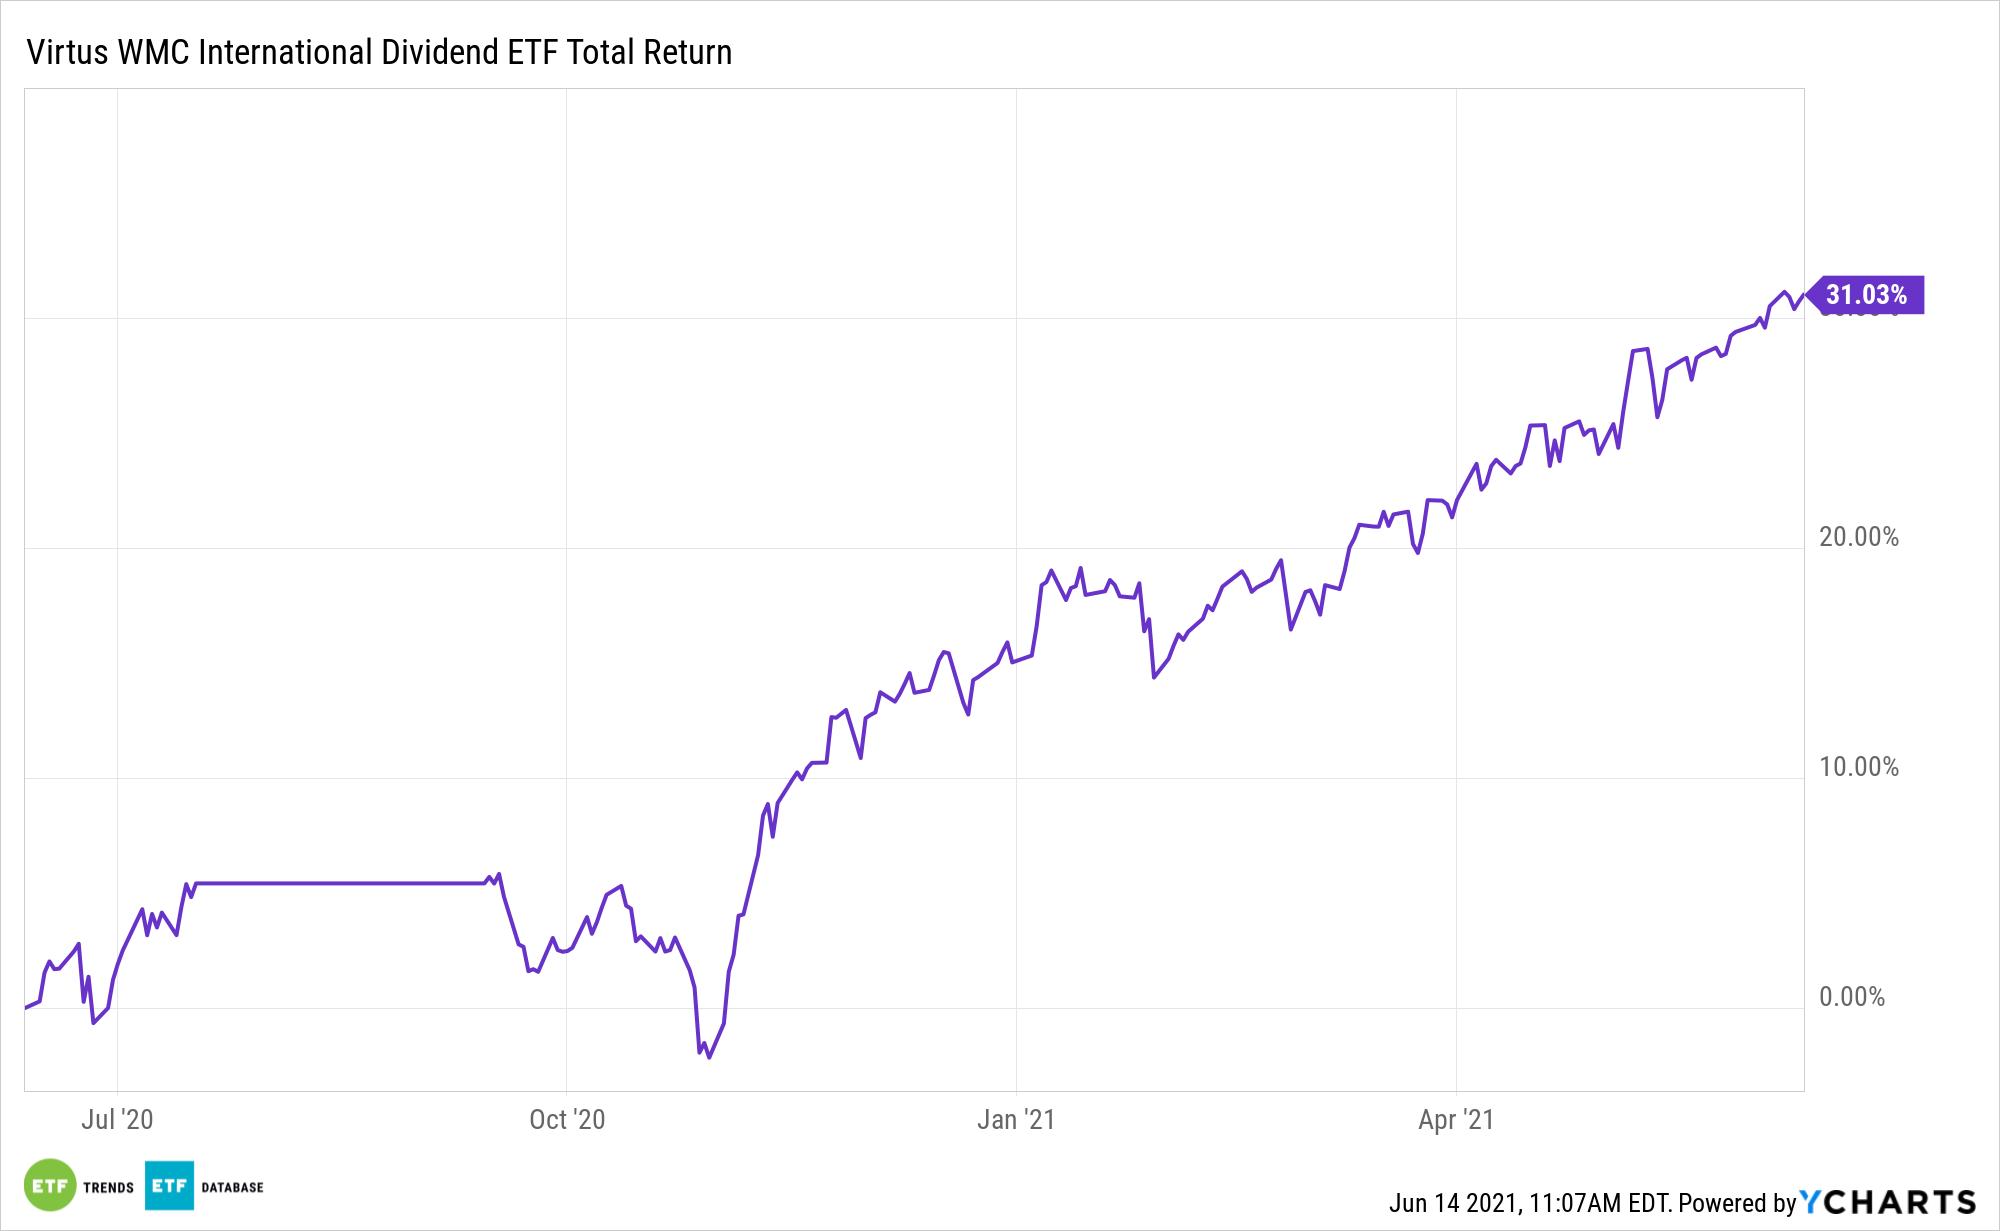 VWID 1 Year Performance